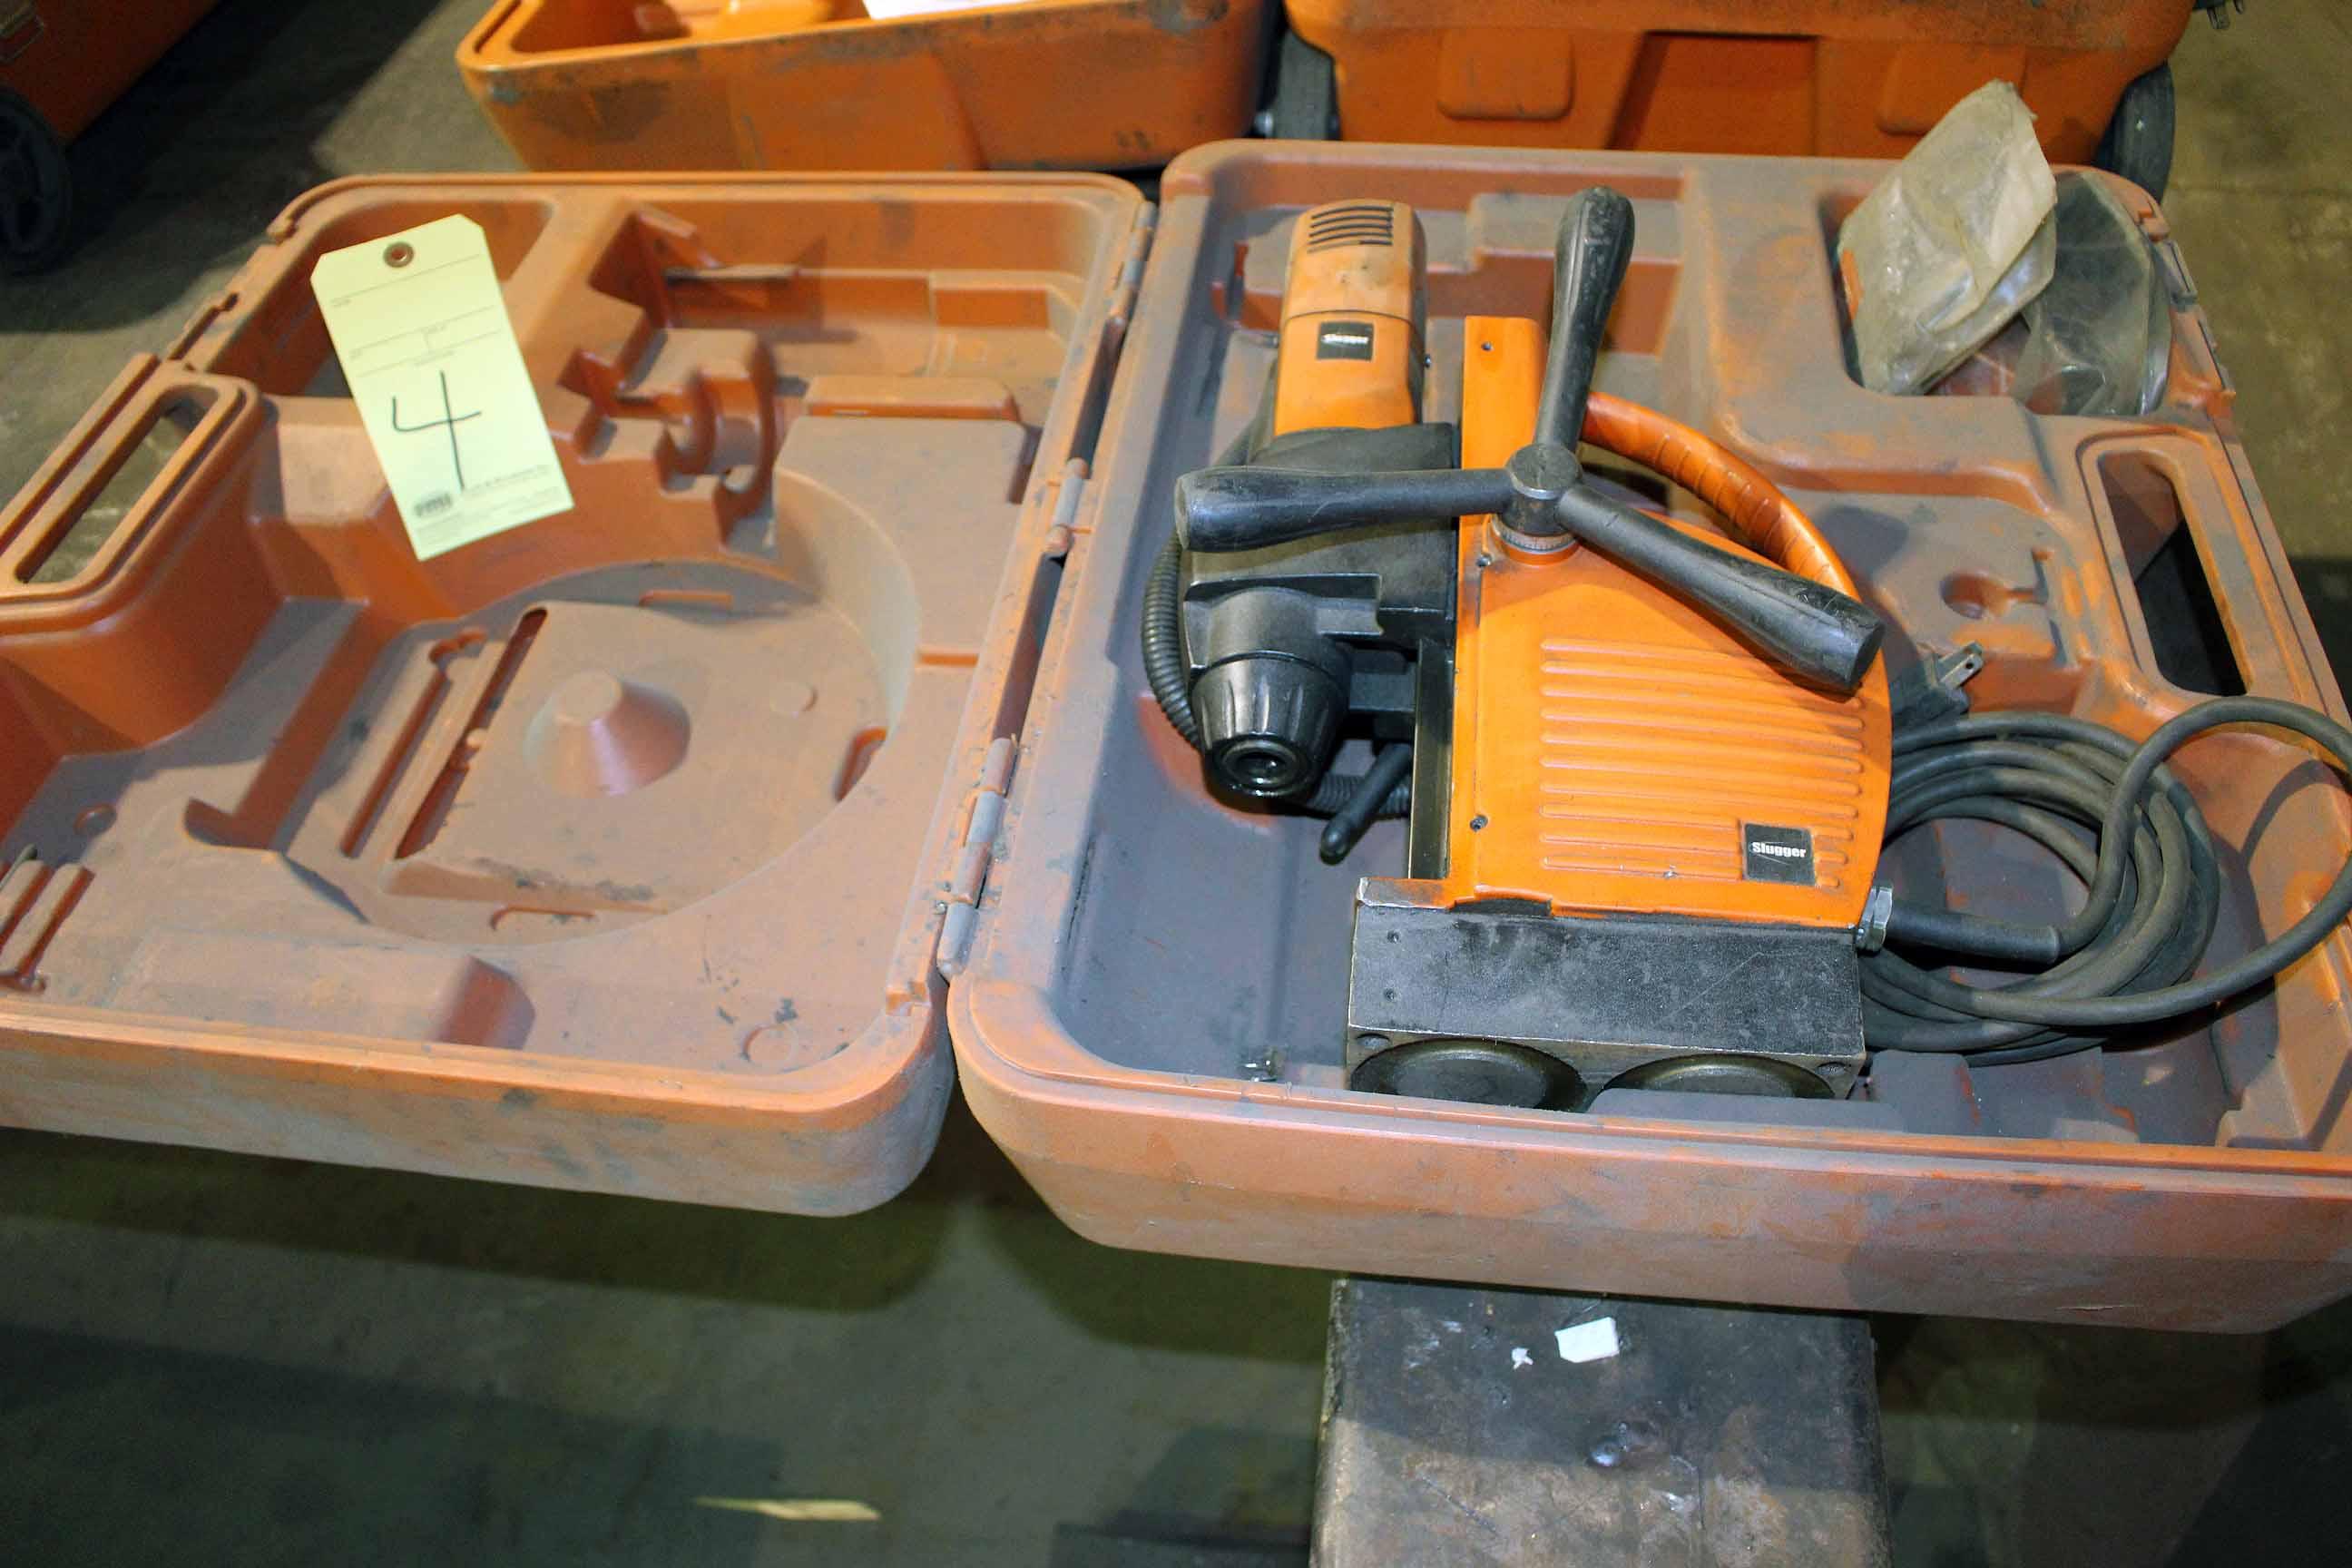 Lot 4 - MAGNETIC BASE DRILL, SLUGGER 1 MDL. JCM125Q